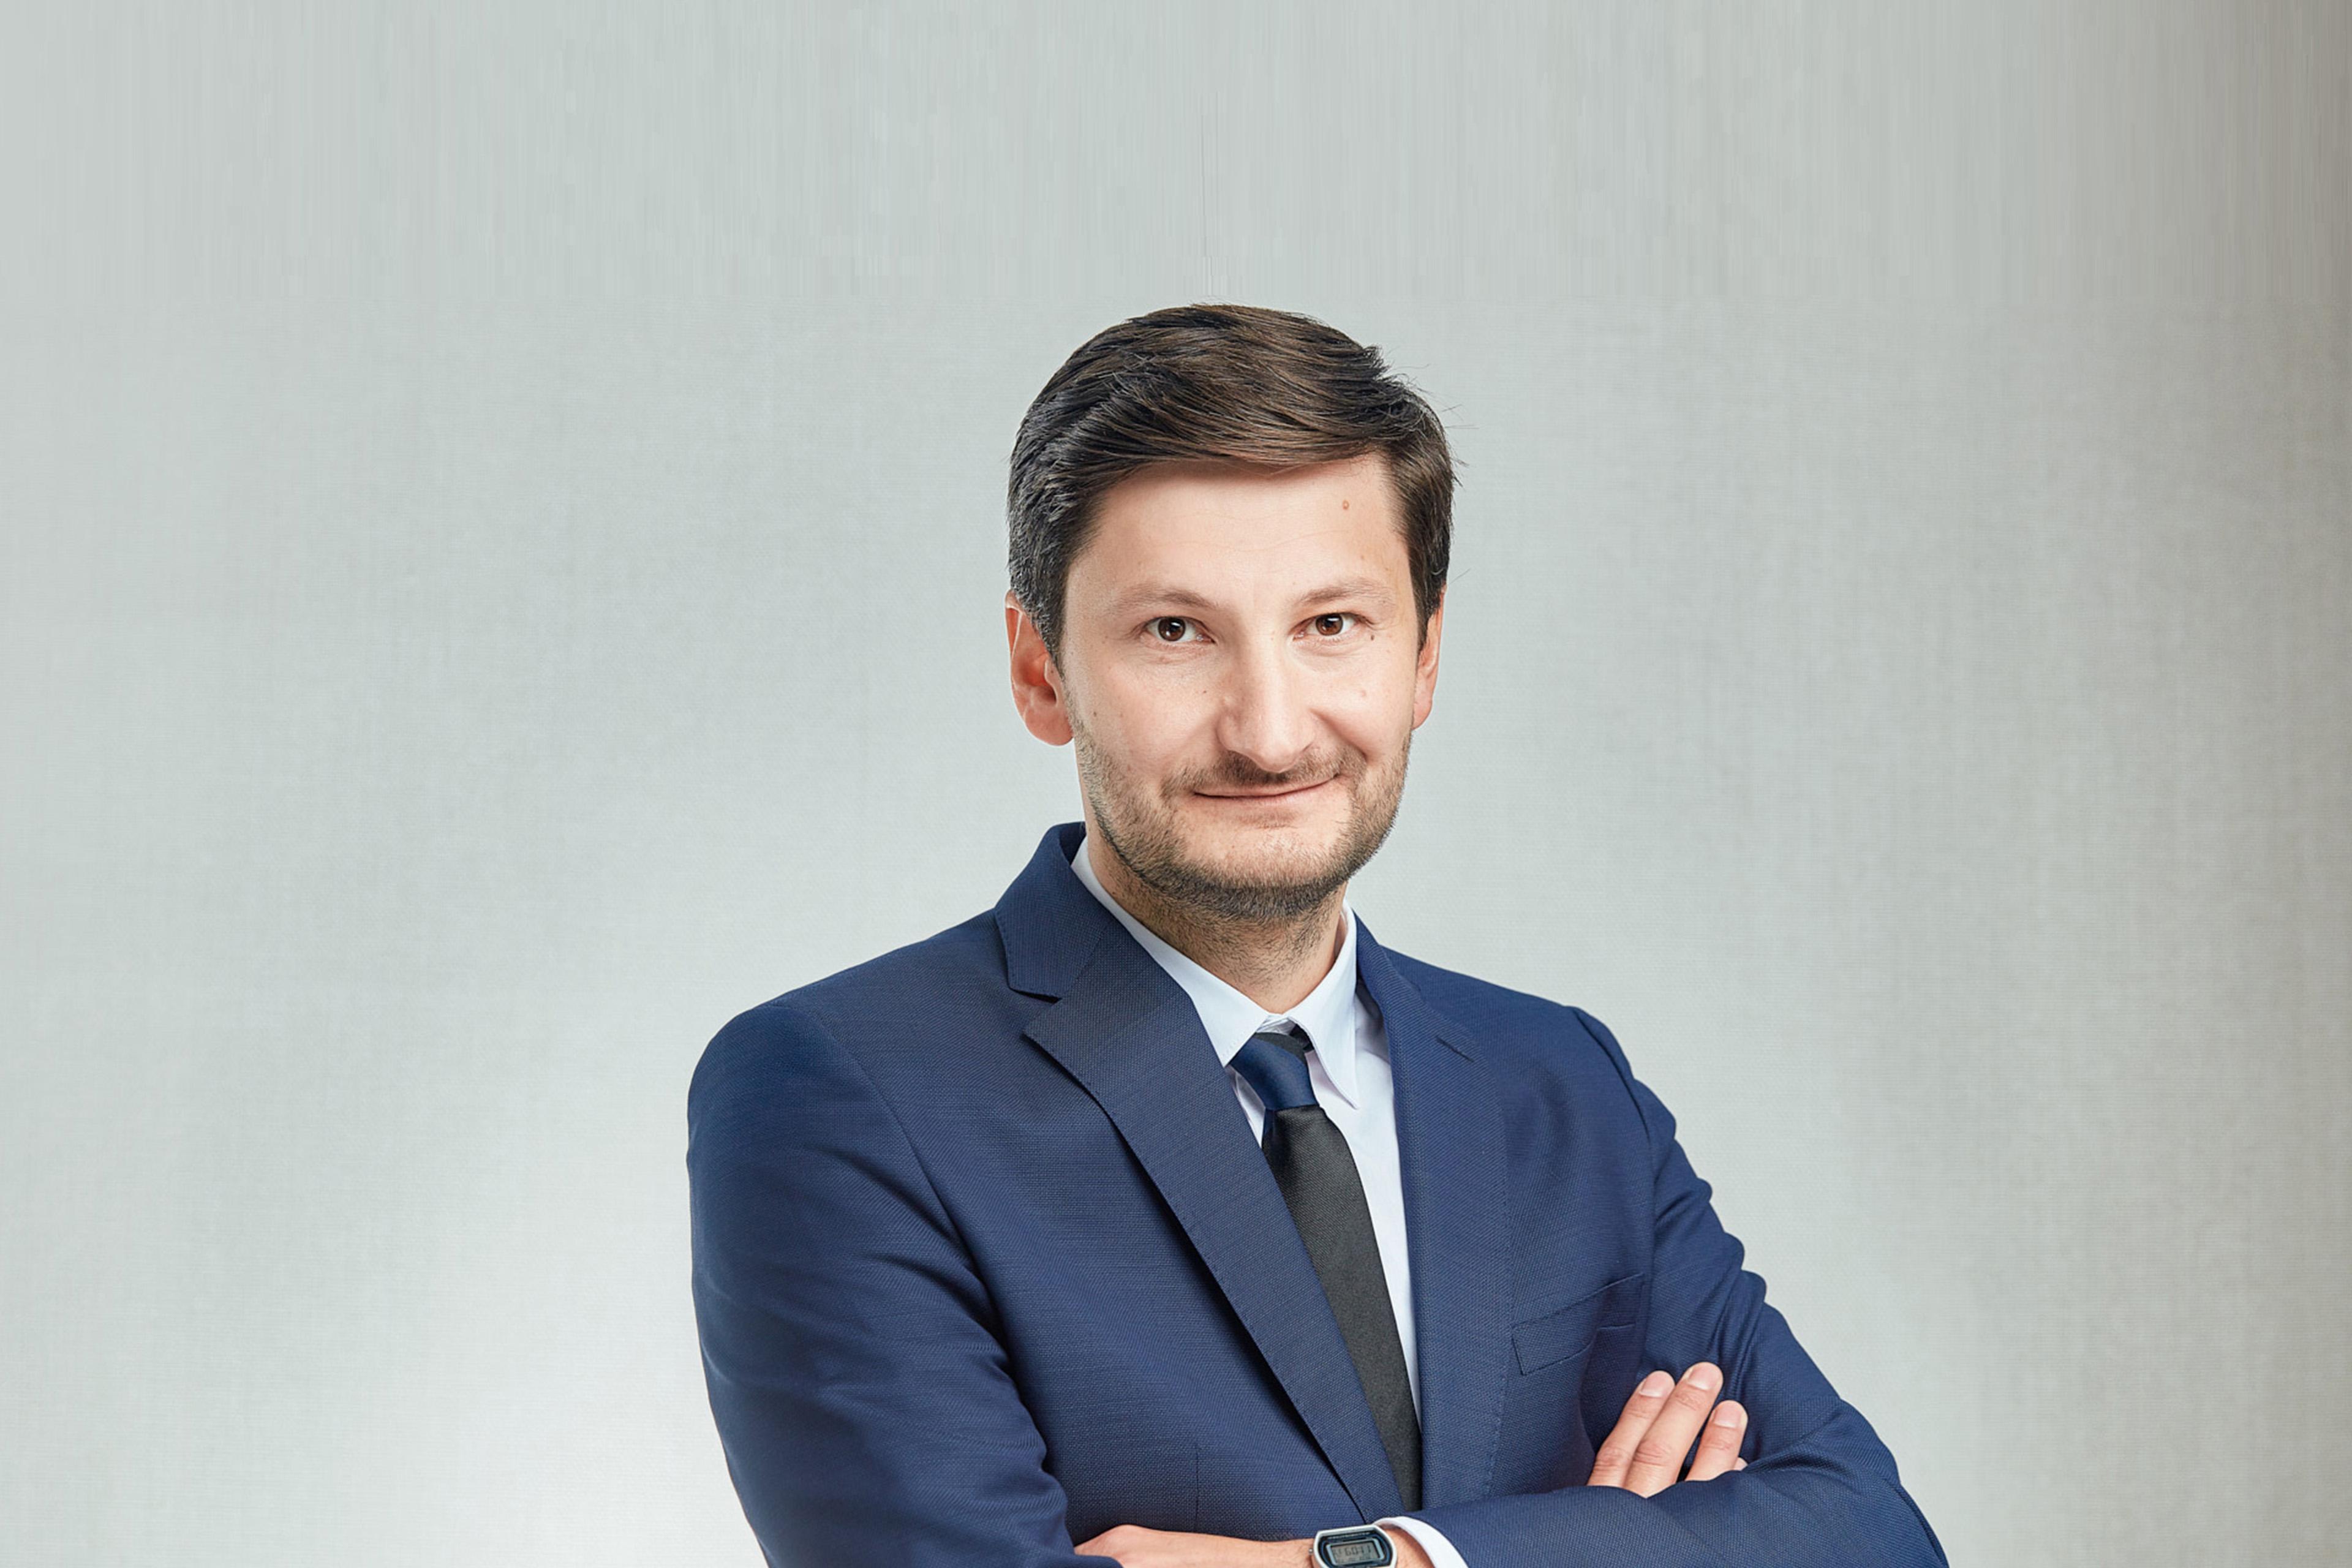 2019 Entrepreneur Filip Granek